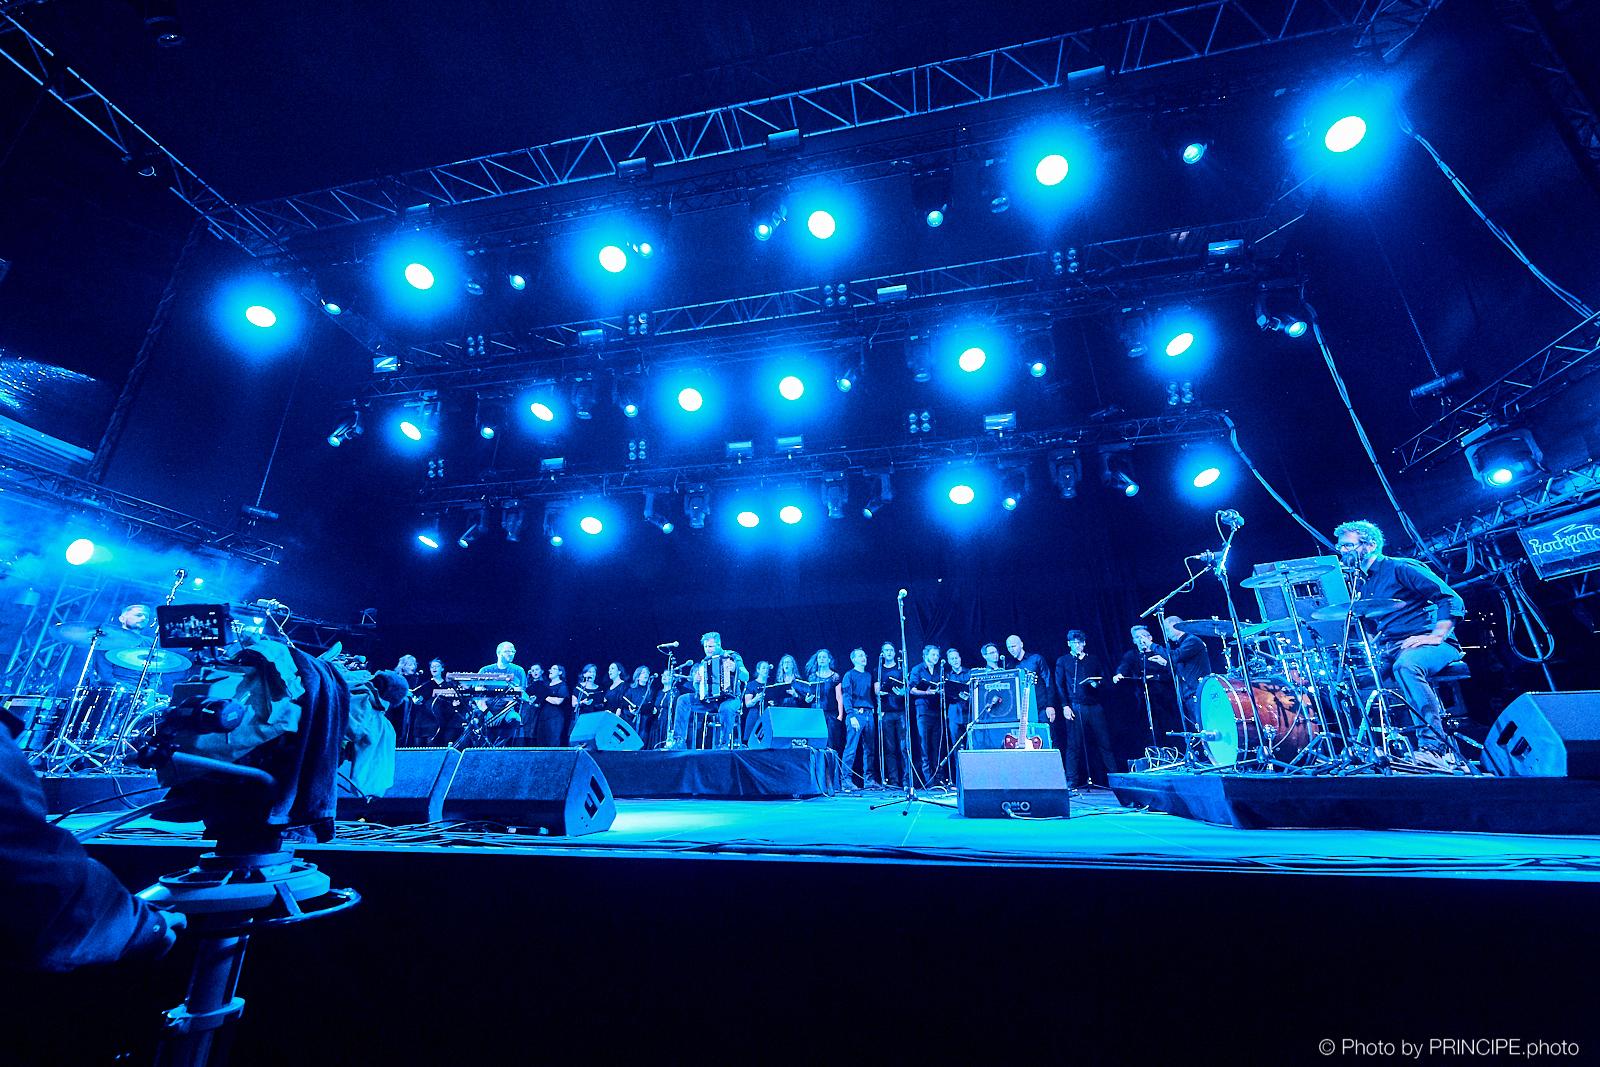 Mario Batkovic @ Haldern Pop Festival